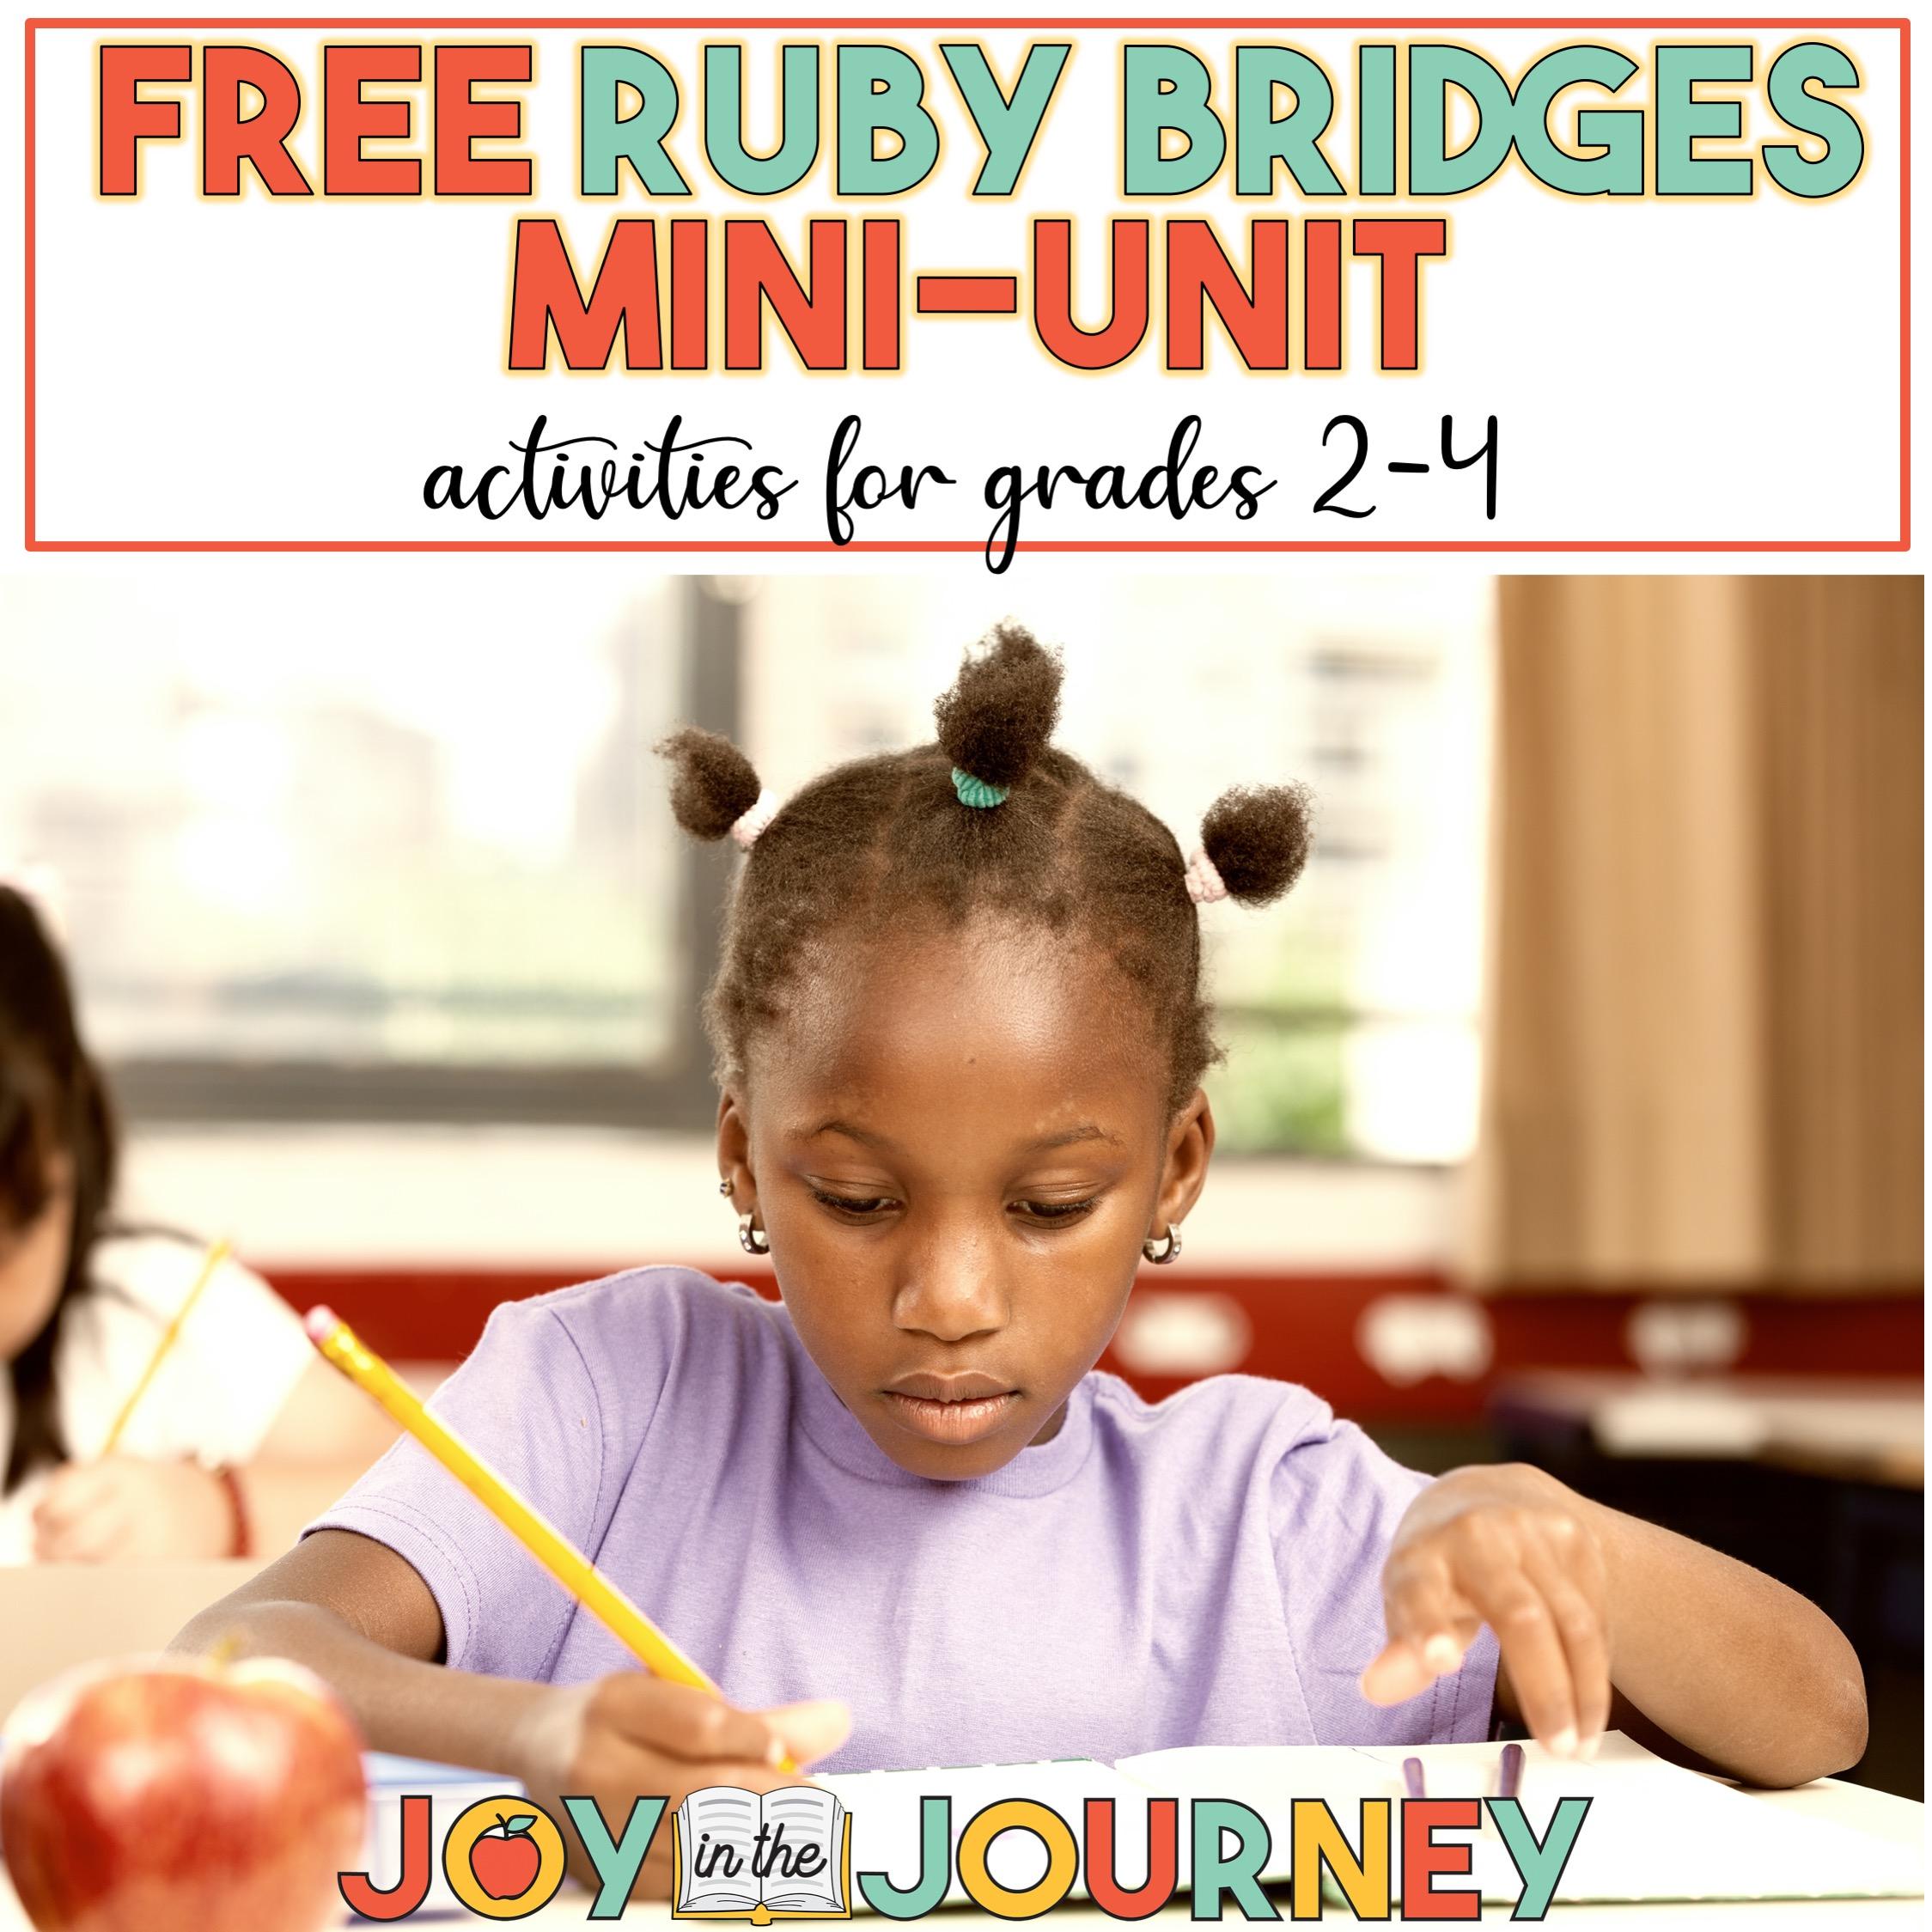 FREE Ruby Bridges Activities